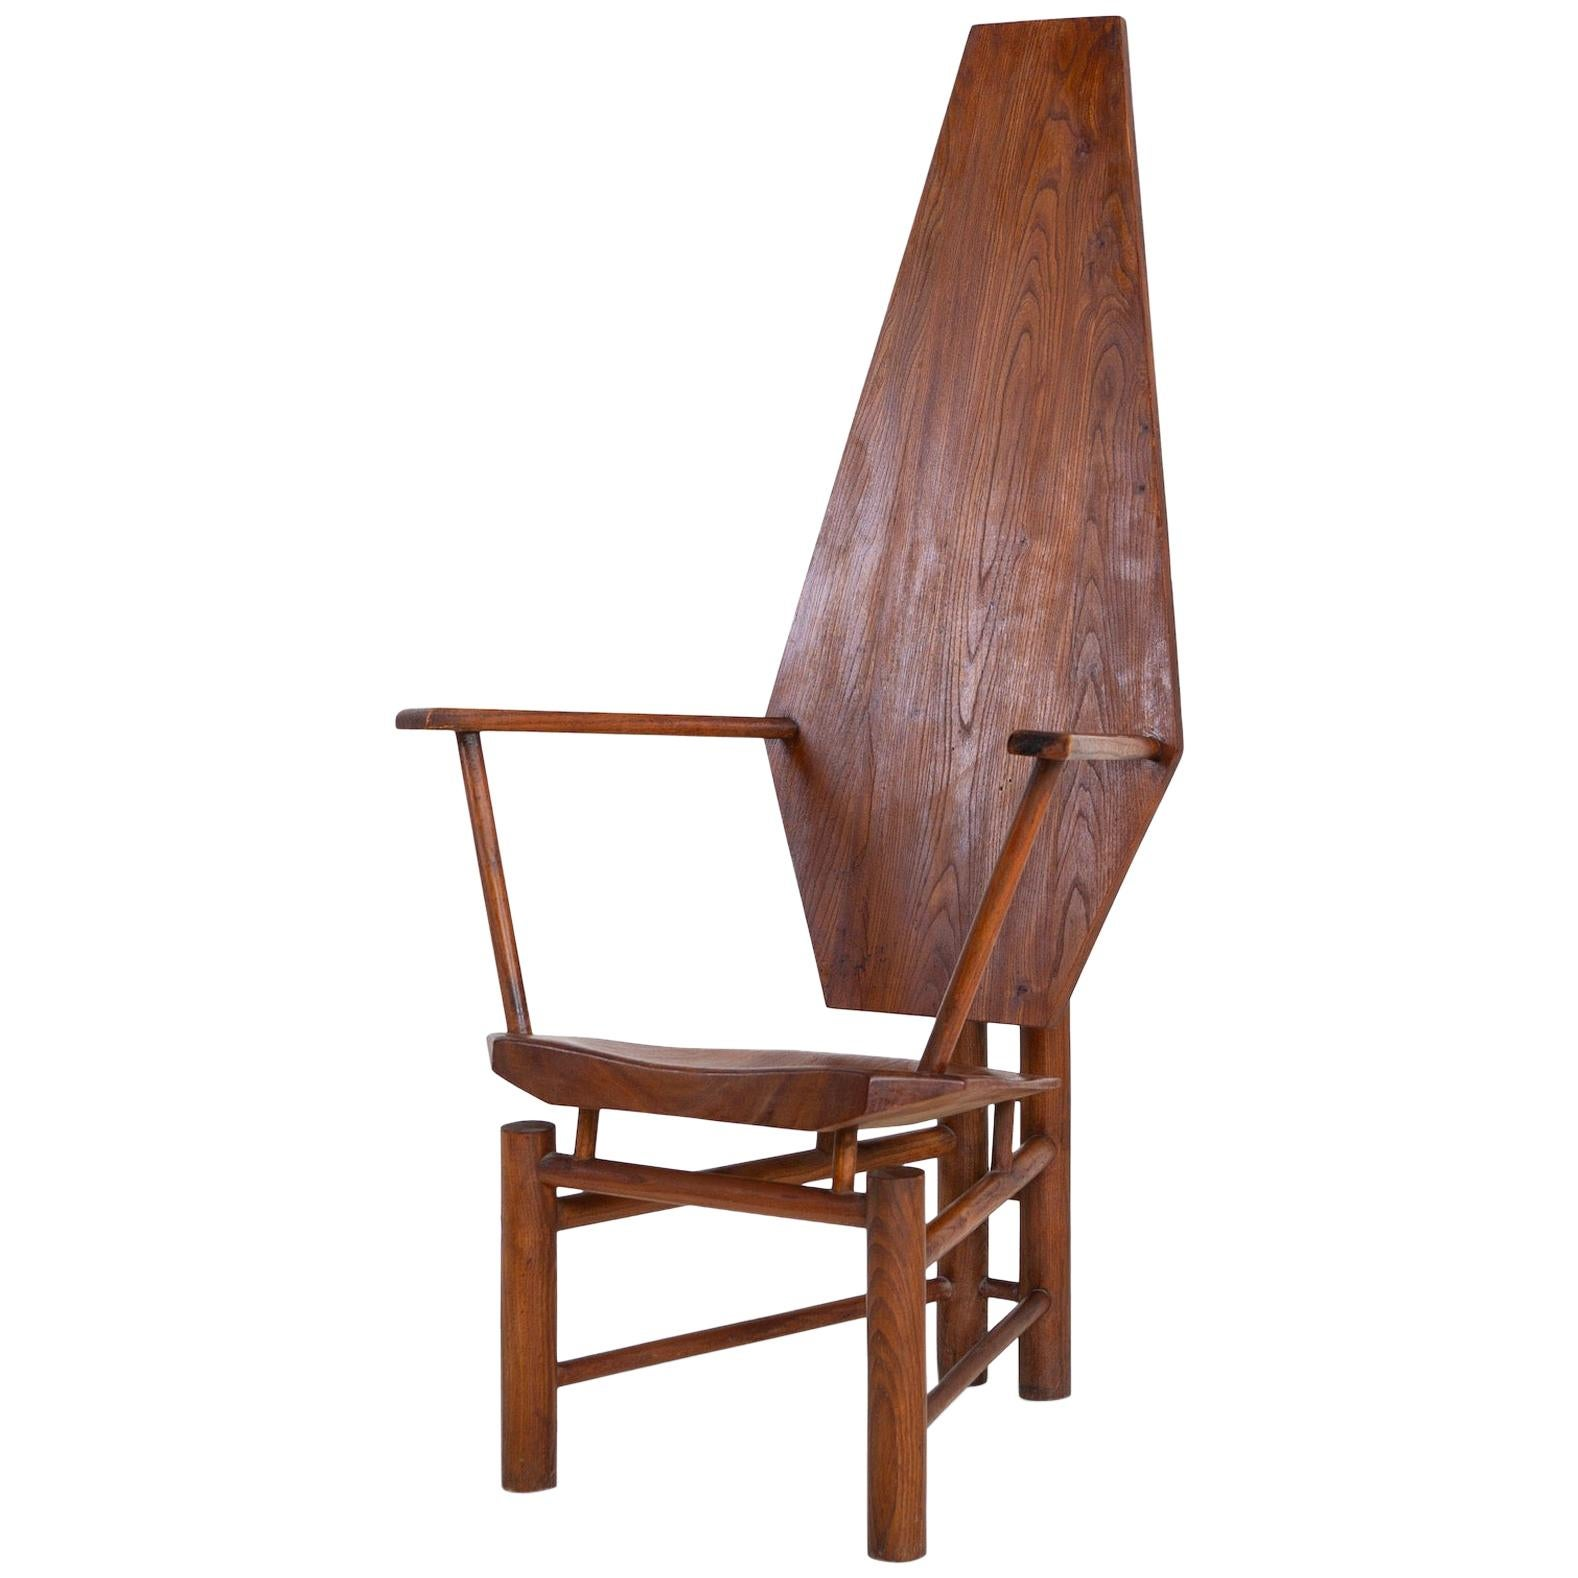 Sculptural Wooden Armchair, Mid-20th Century